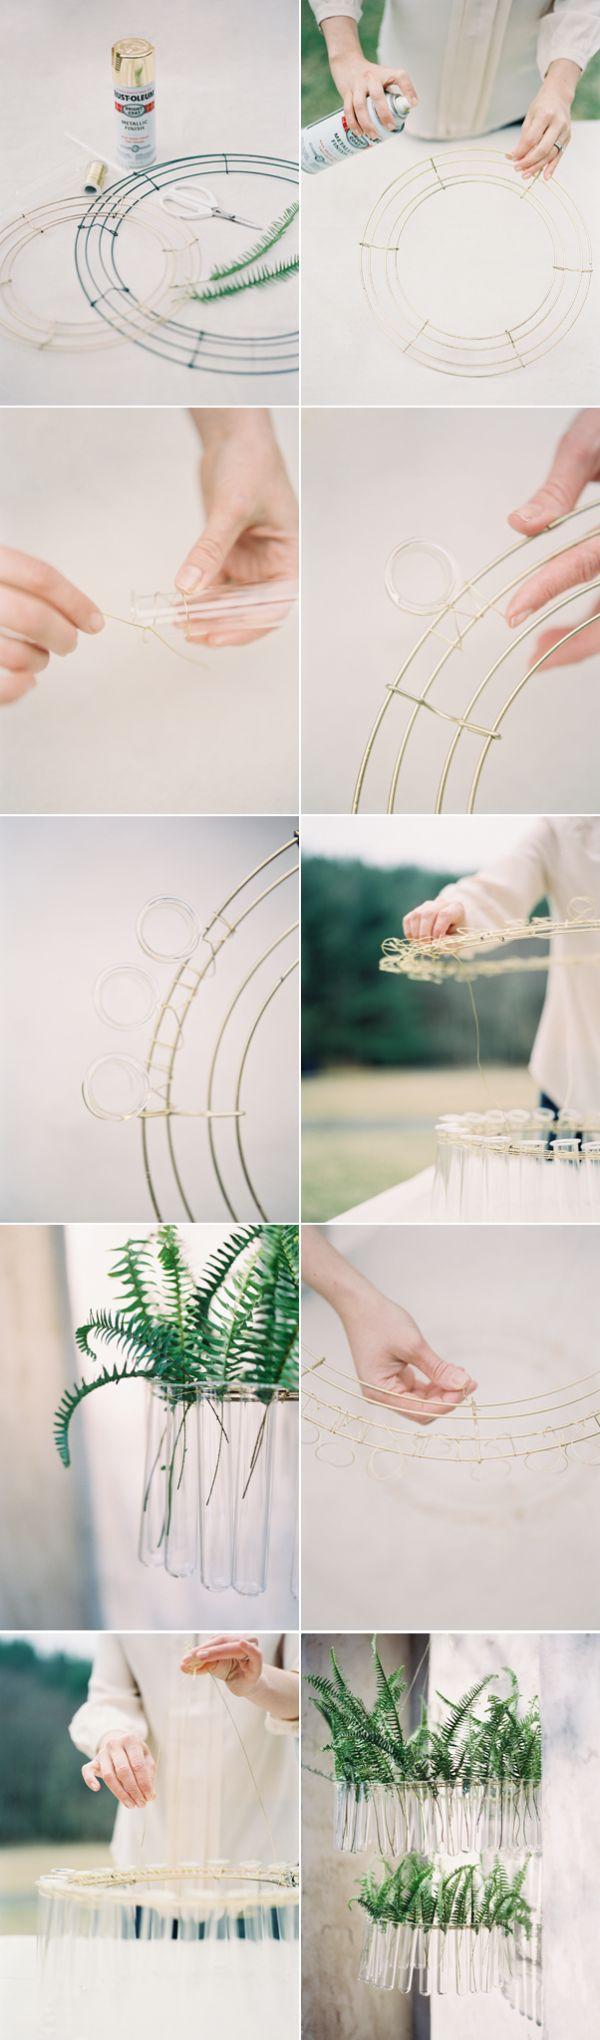 diy-test-tube-chandelier-tutorial1